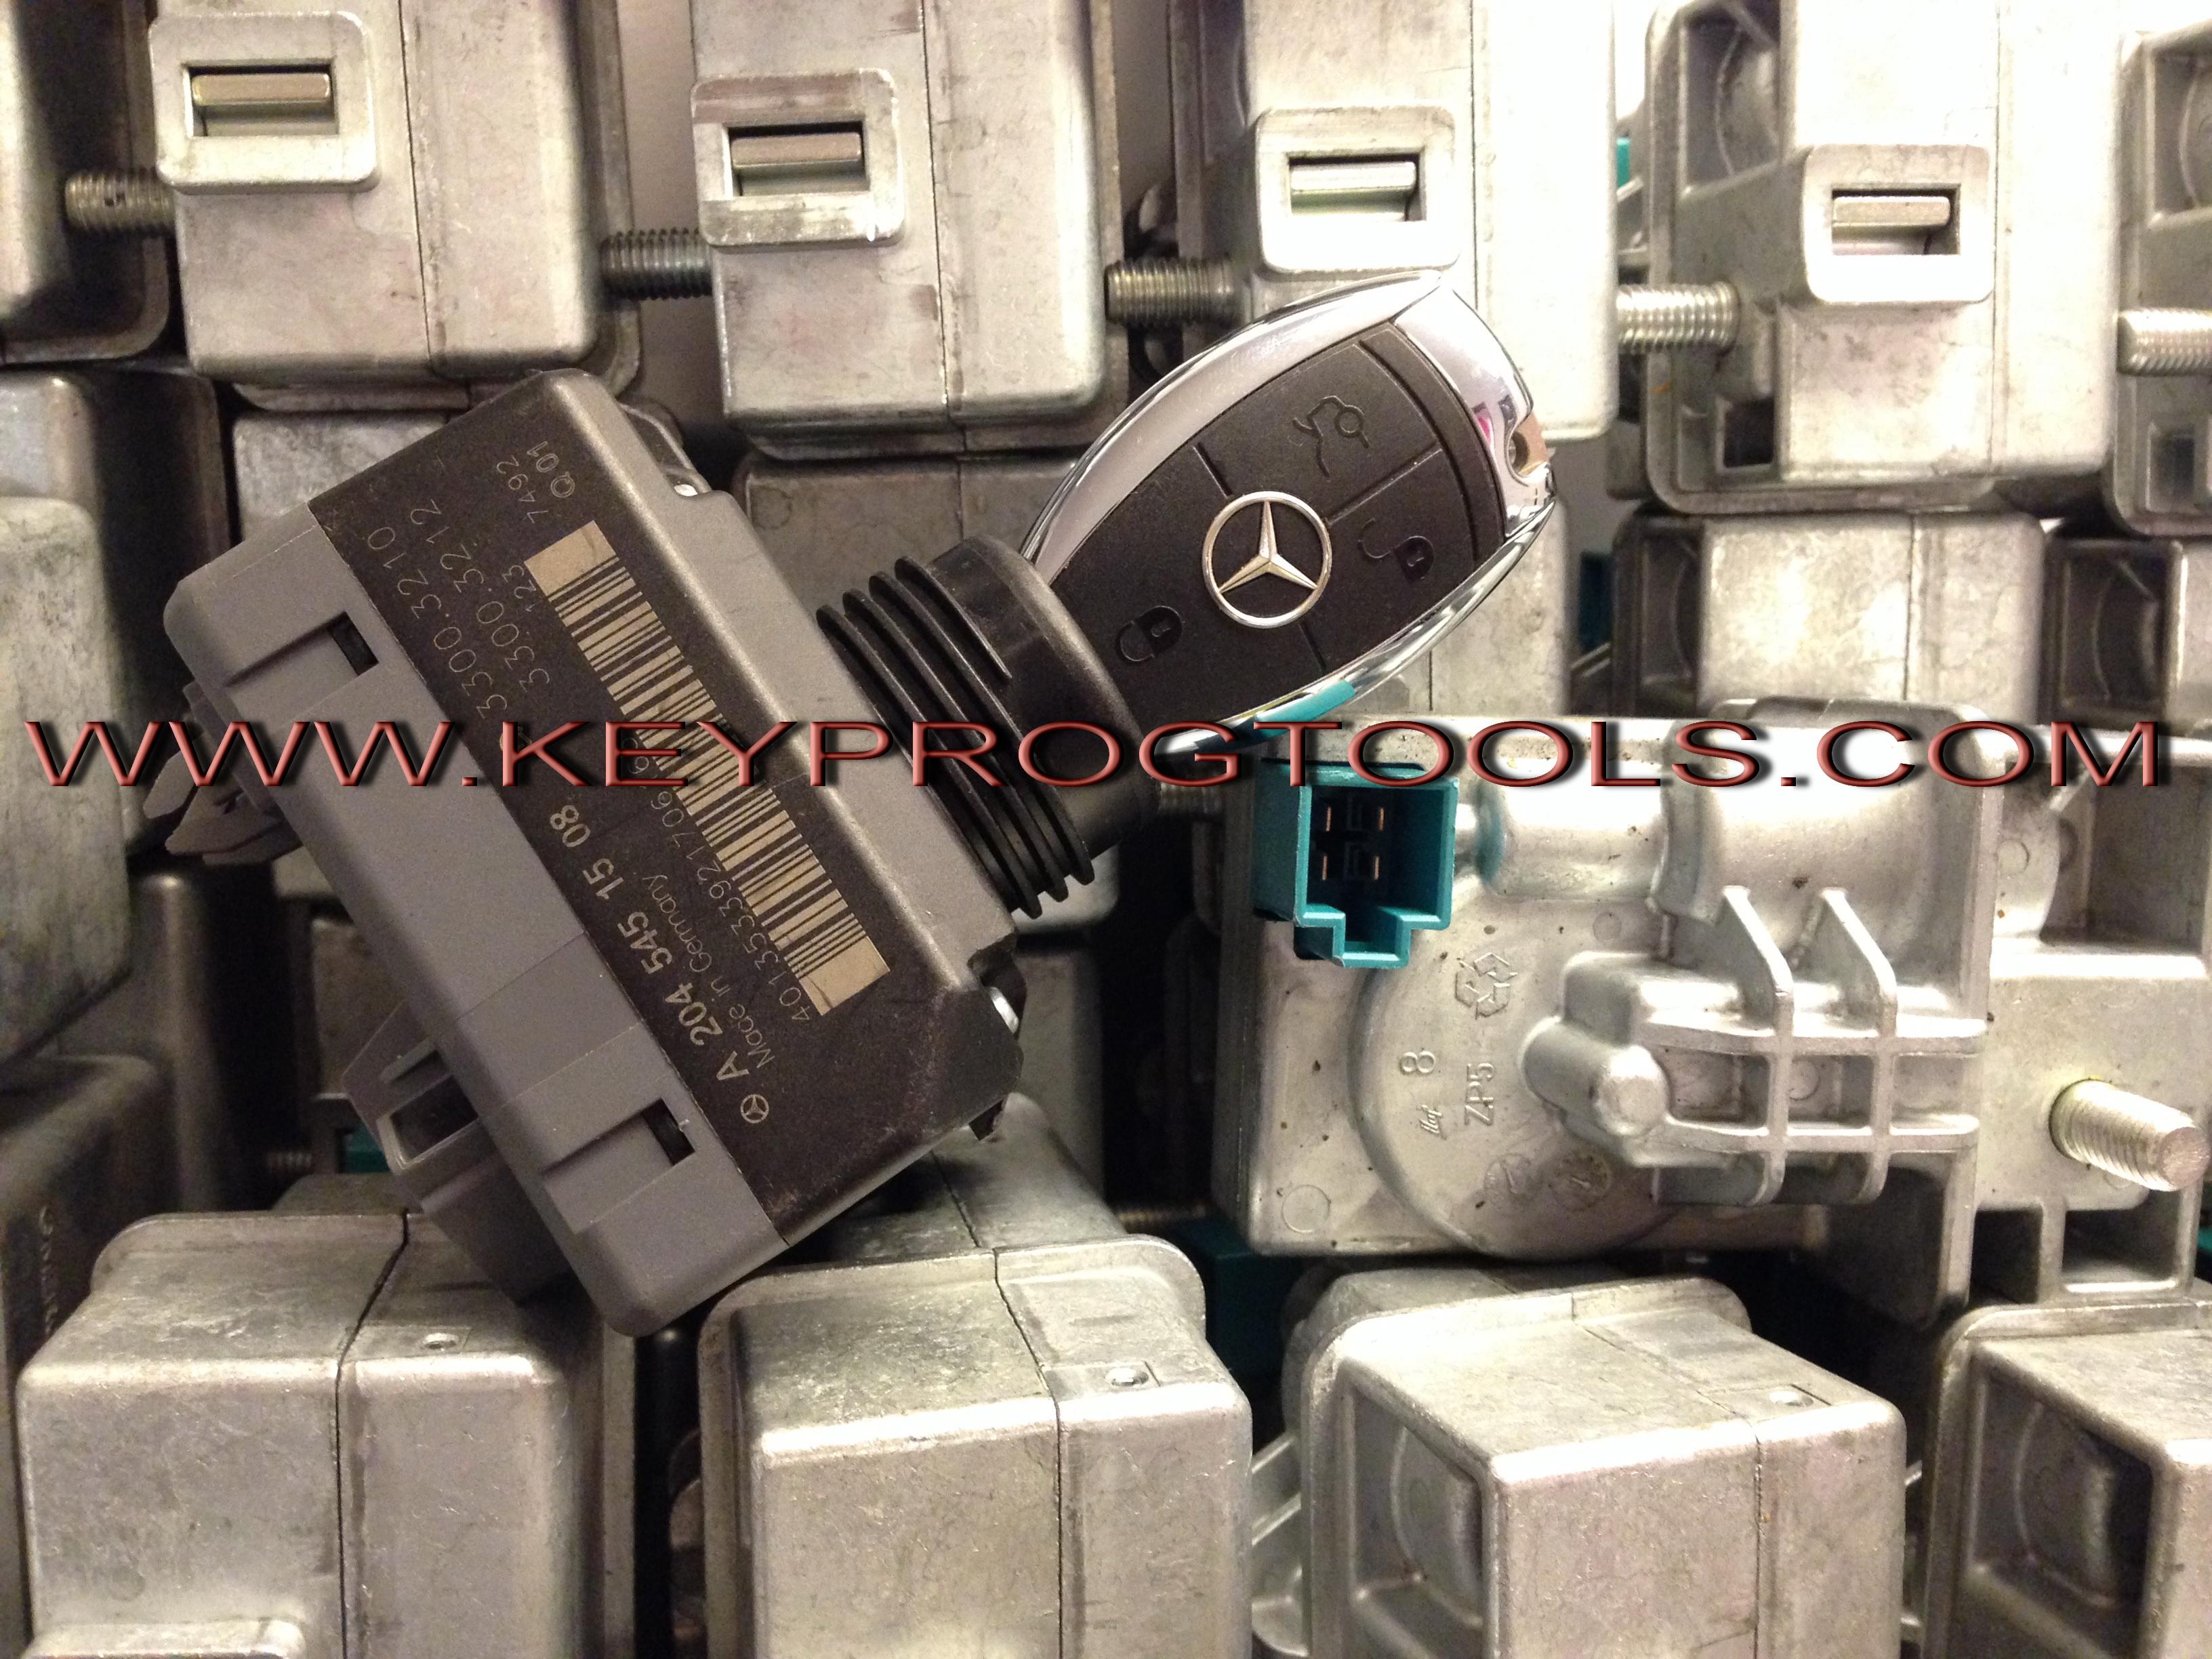 Mercedes Chrome Remote key avdi commander locksmith tools